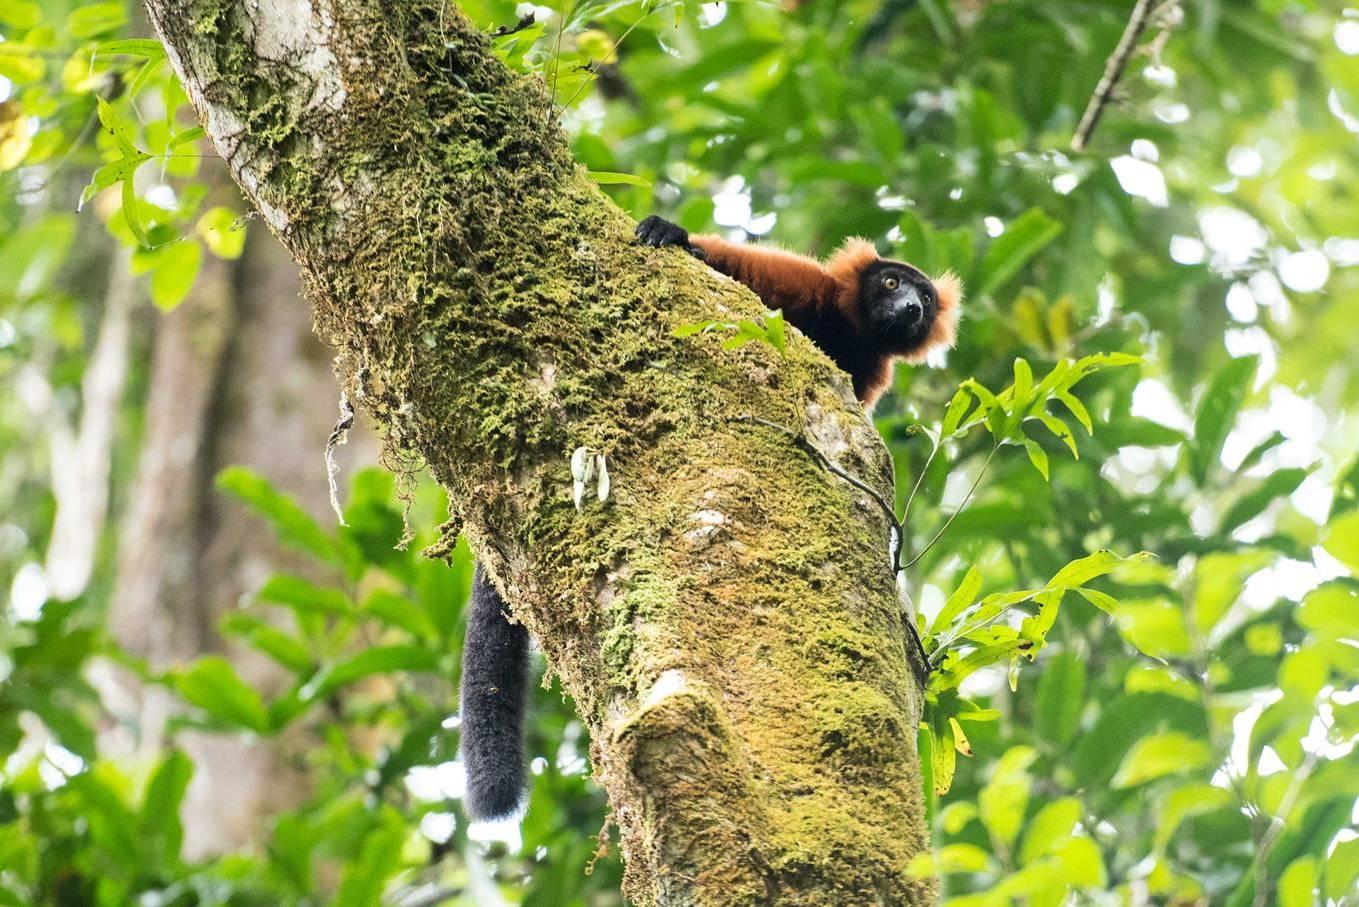 Red-Ruffed-Lemur-by-Simon-Bellingham-Copy-e1566907635284